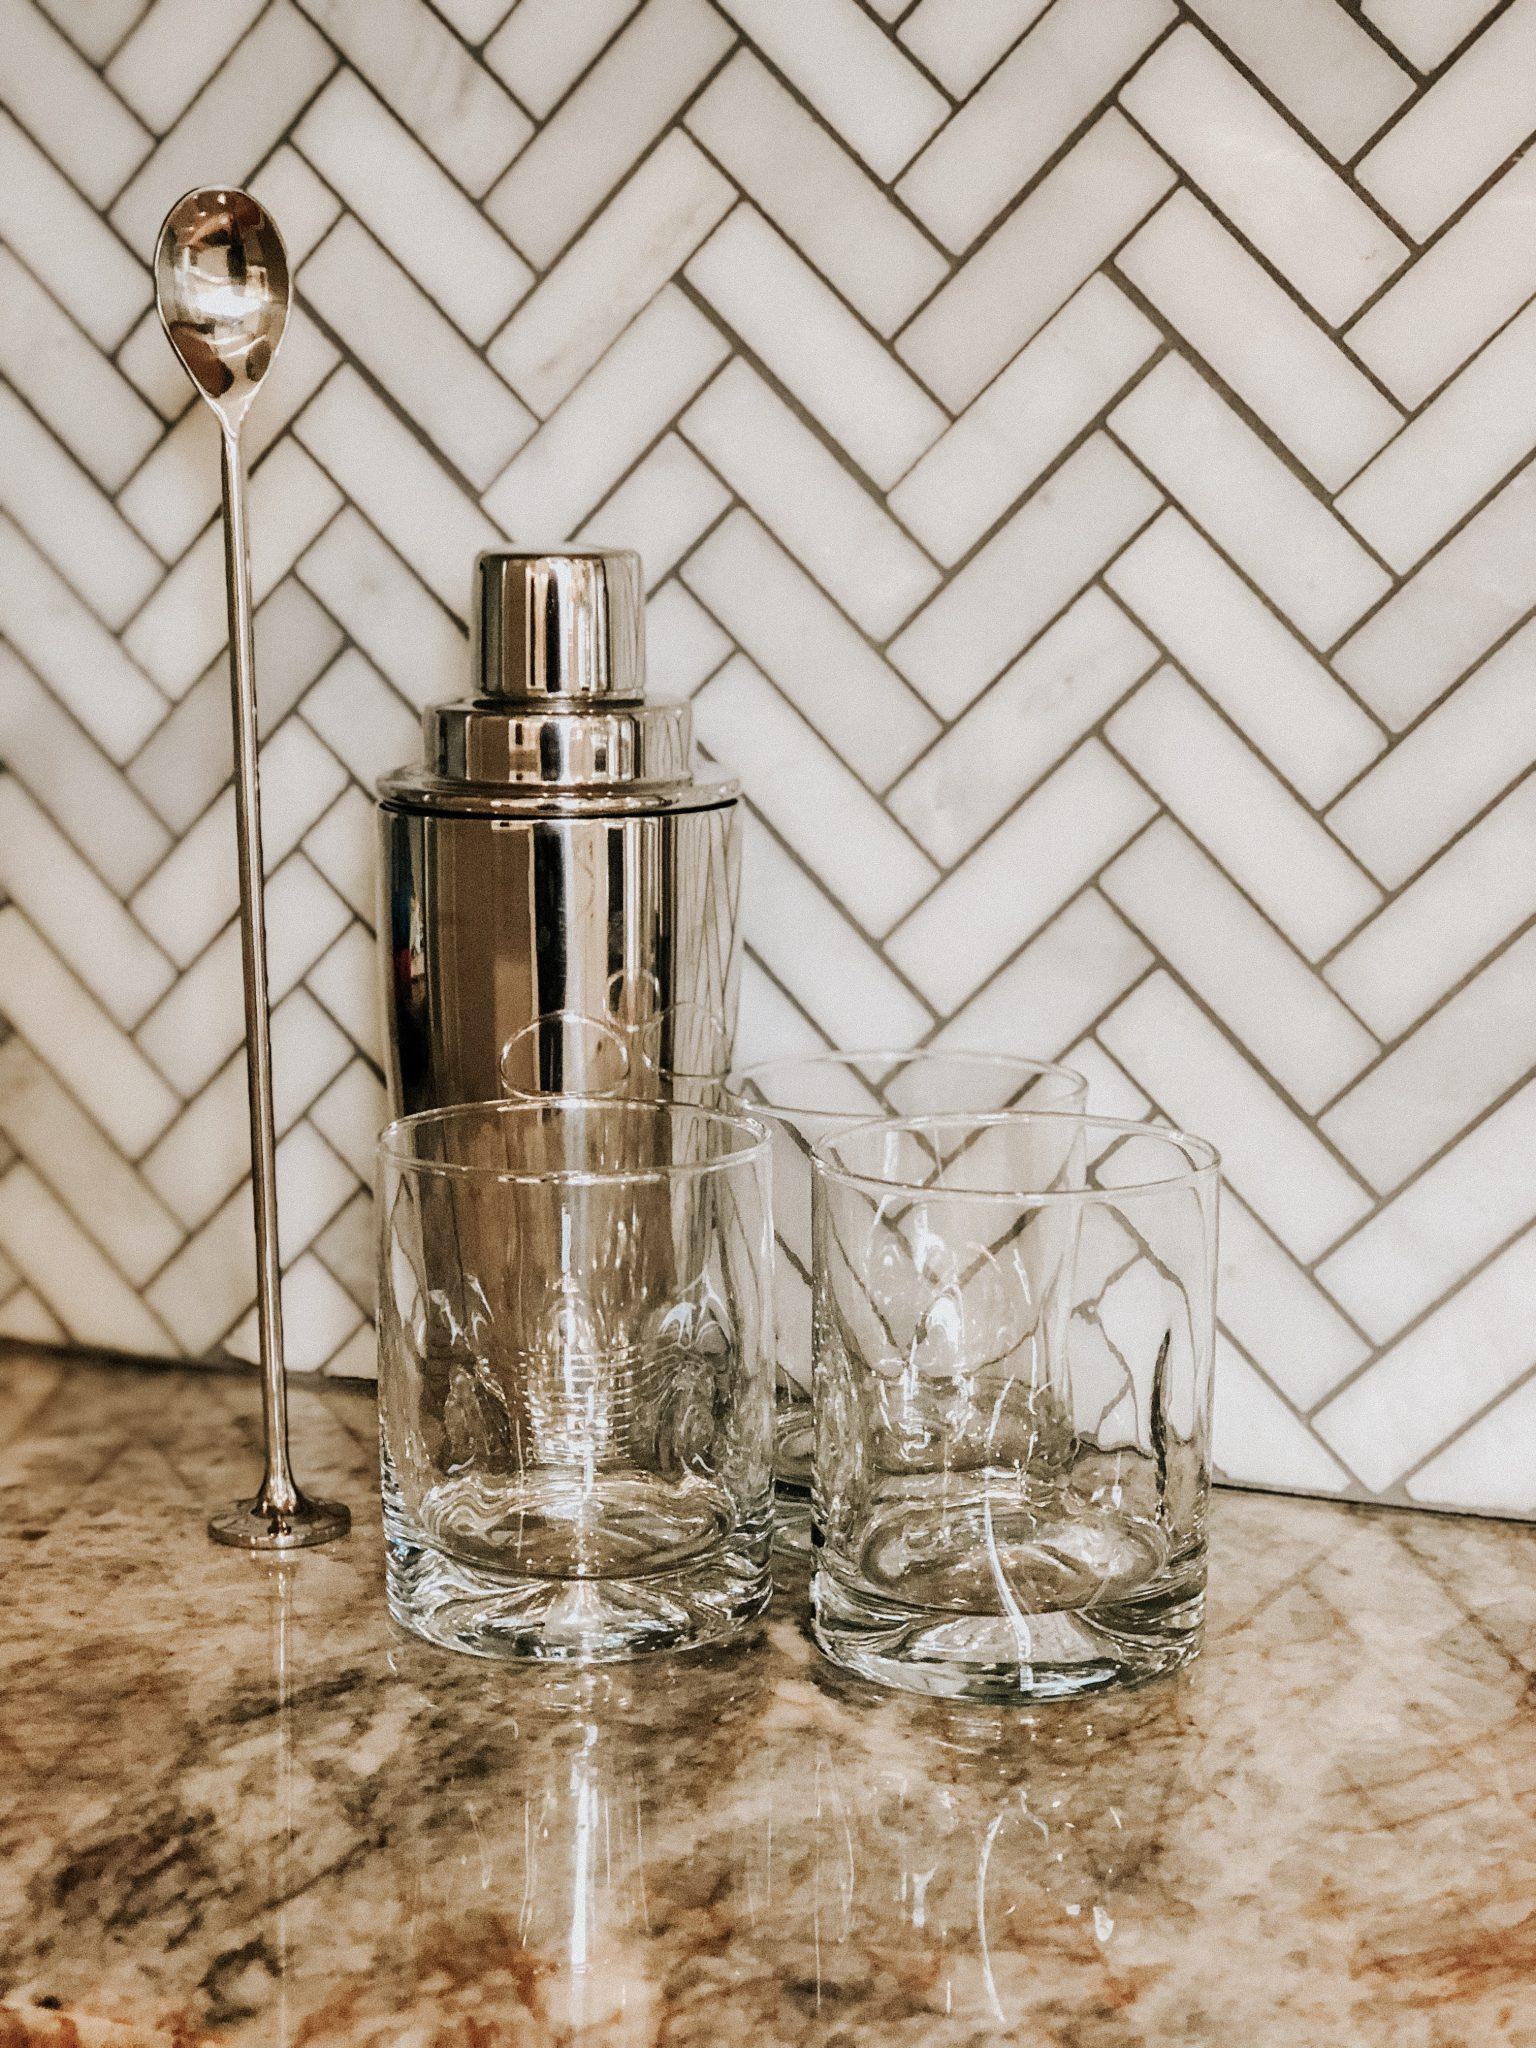 Simple Home Bar Setup | Daily Splendor Life and Style Blog | rocks glass, shaker, muddler, home bar, hostess, hosting #homebar #cocktails #entertaining #mixeddrinks